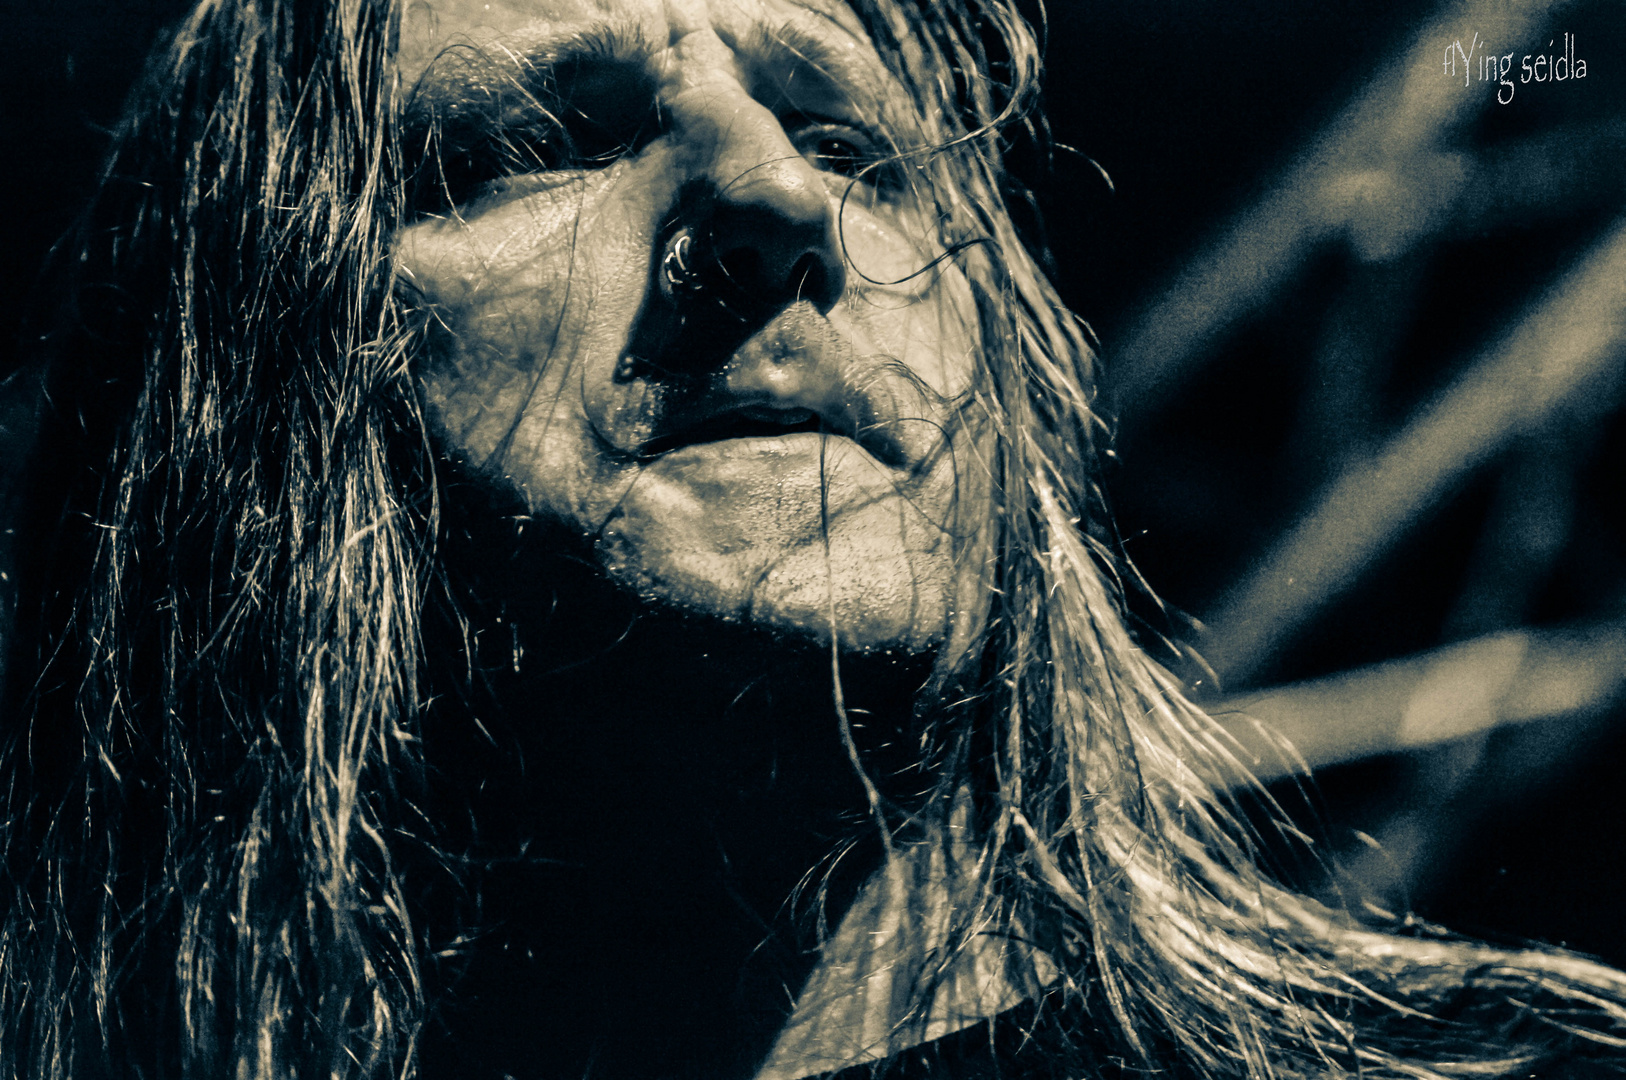 Stefan Fiori, Graveworm